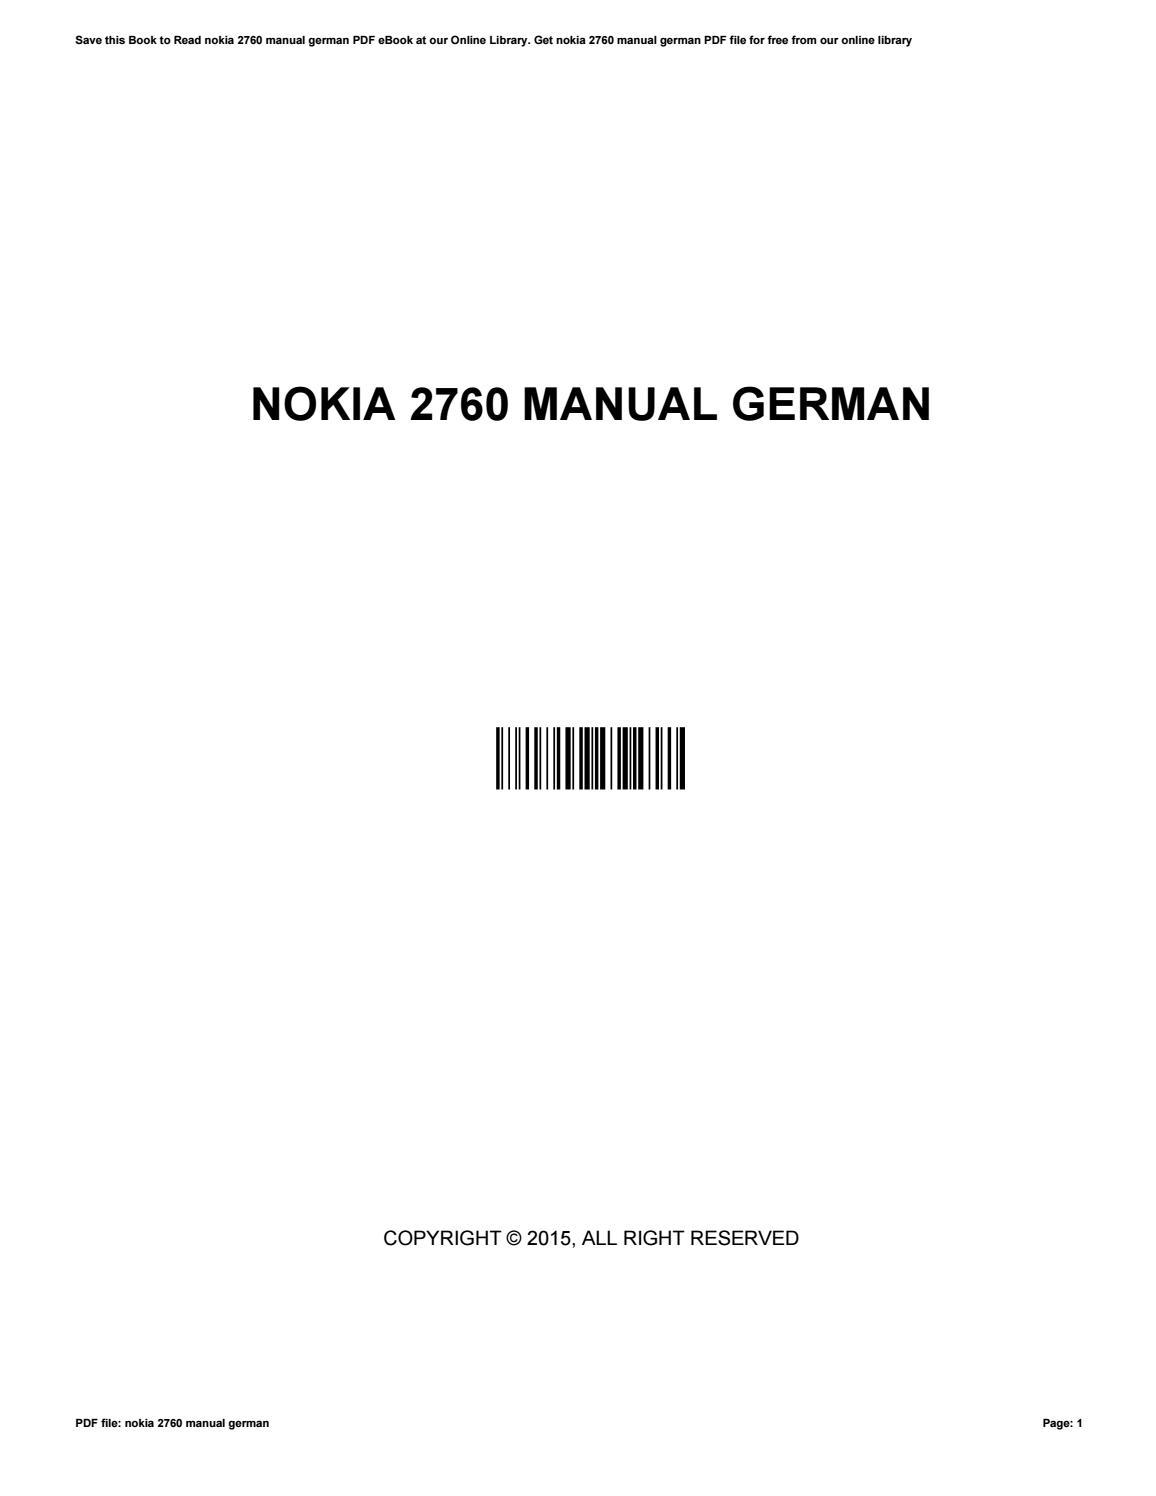 nokia 2760 manual german by marksmith28301 issuu rh issuu com USB Cable for Nokia 2760 Nokia 2720